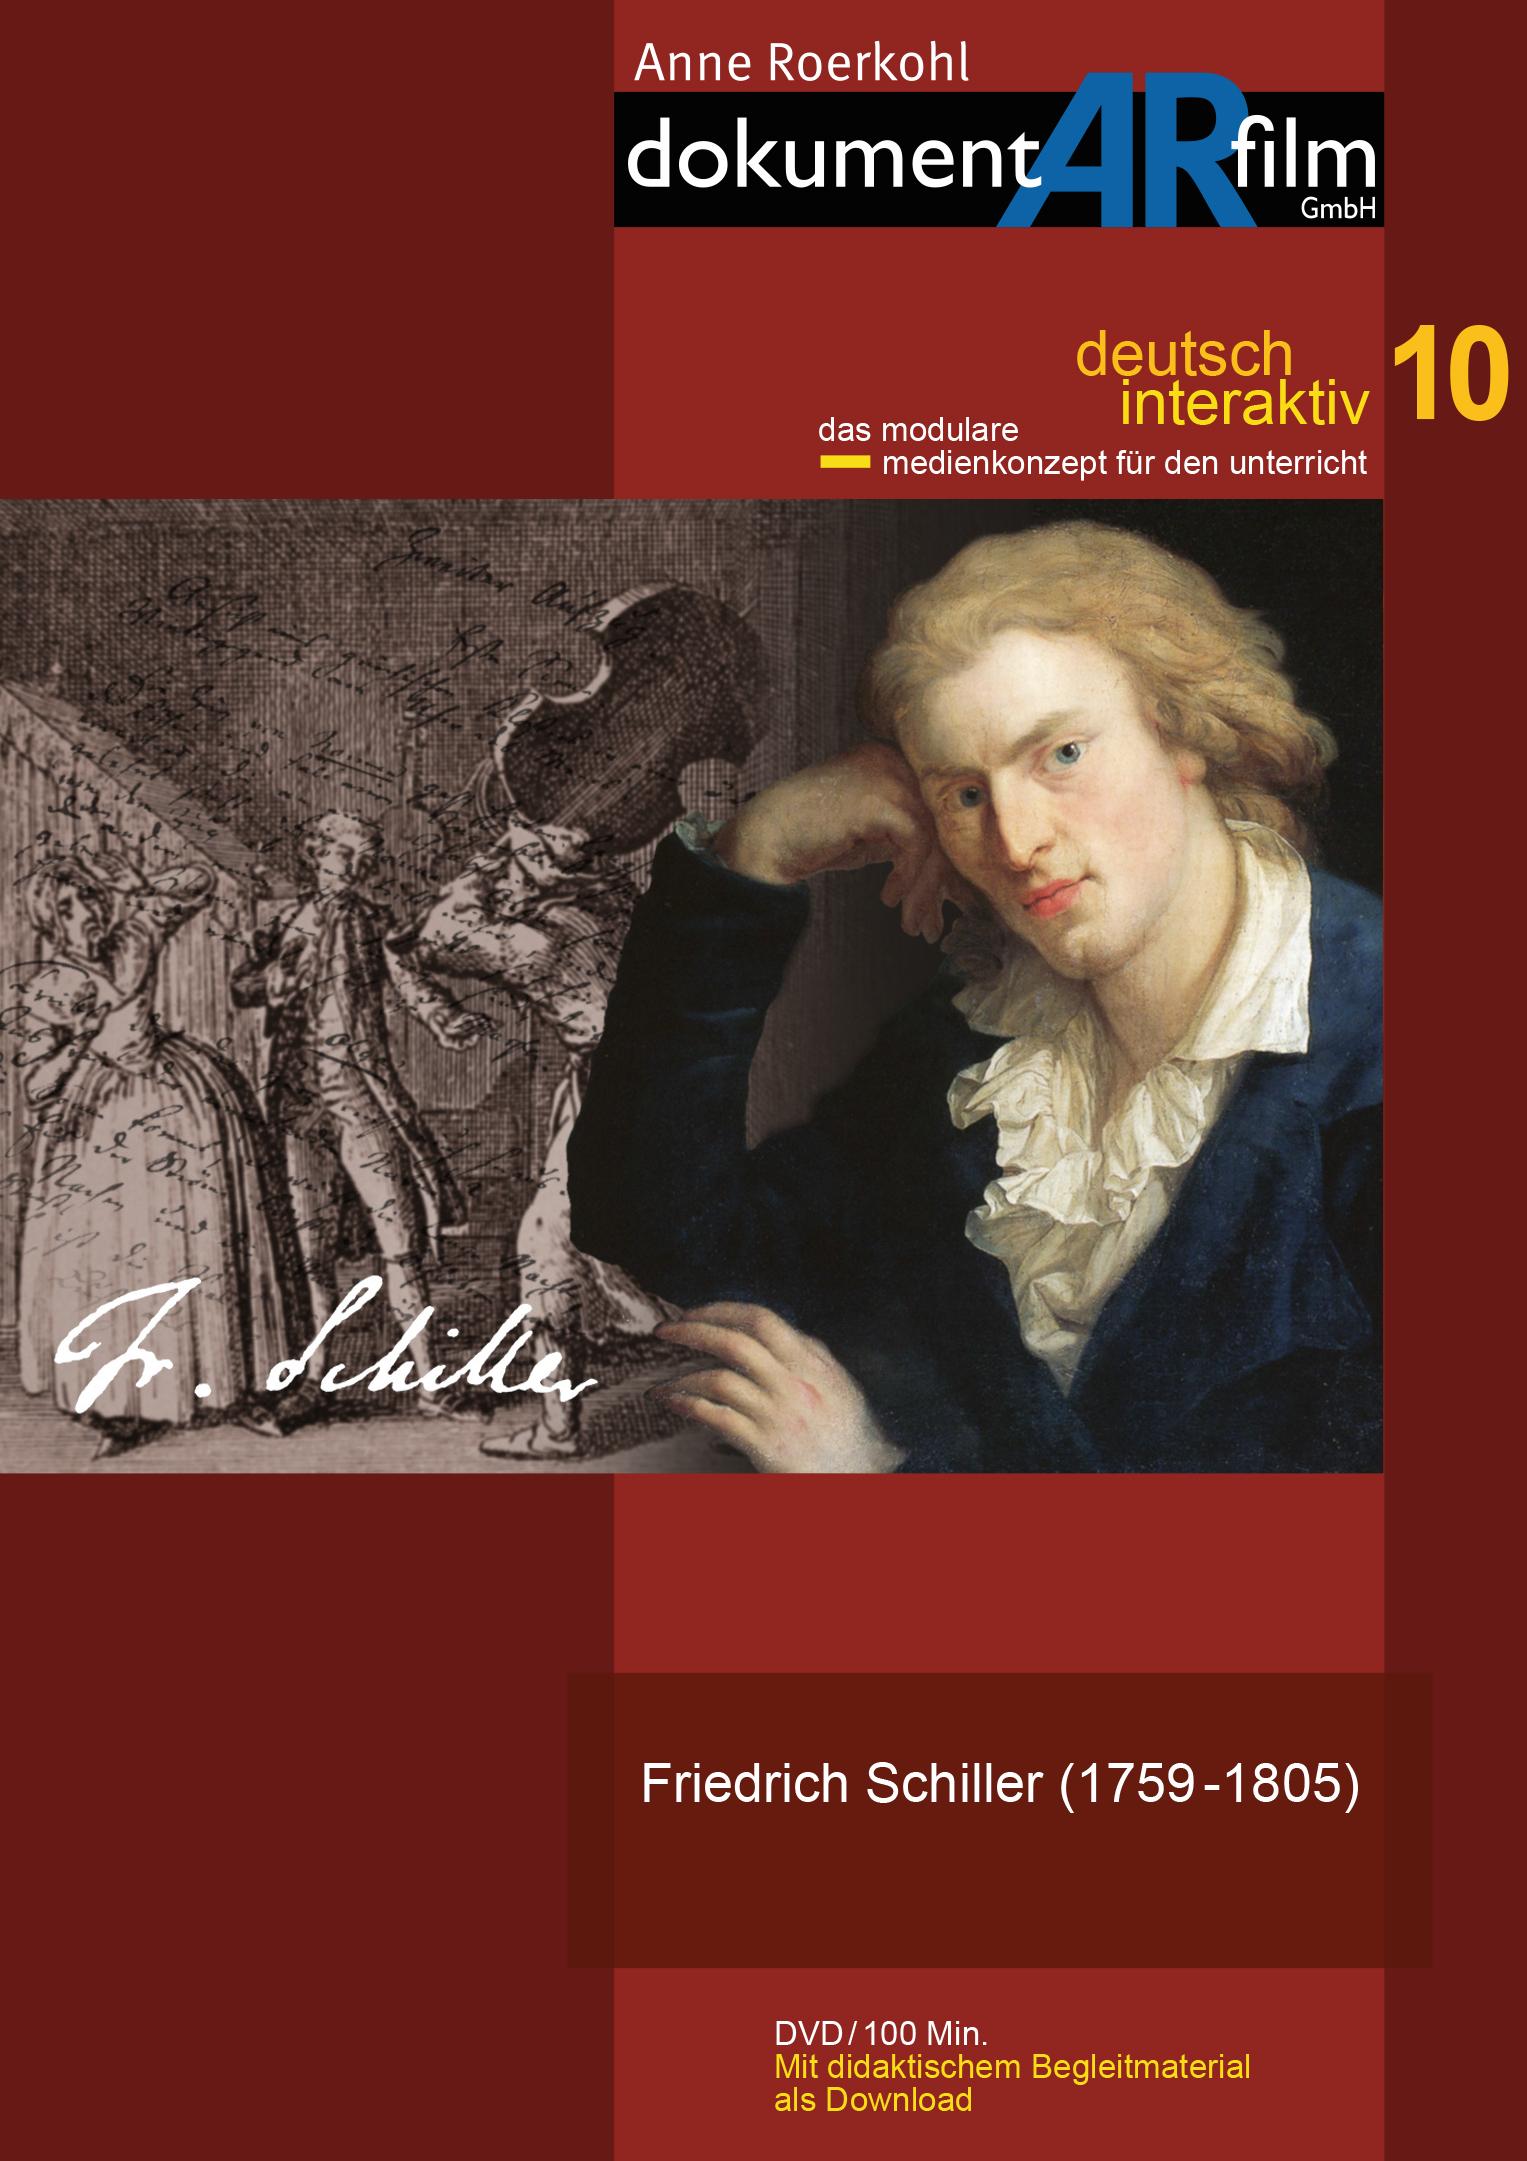 DI10 Friedrich Schiller 1759 1805 Friedrich Schiller Anne